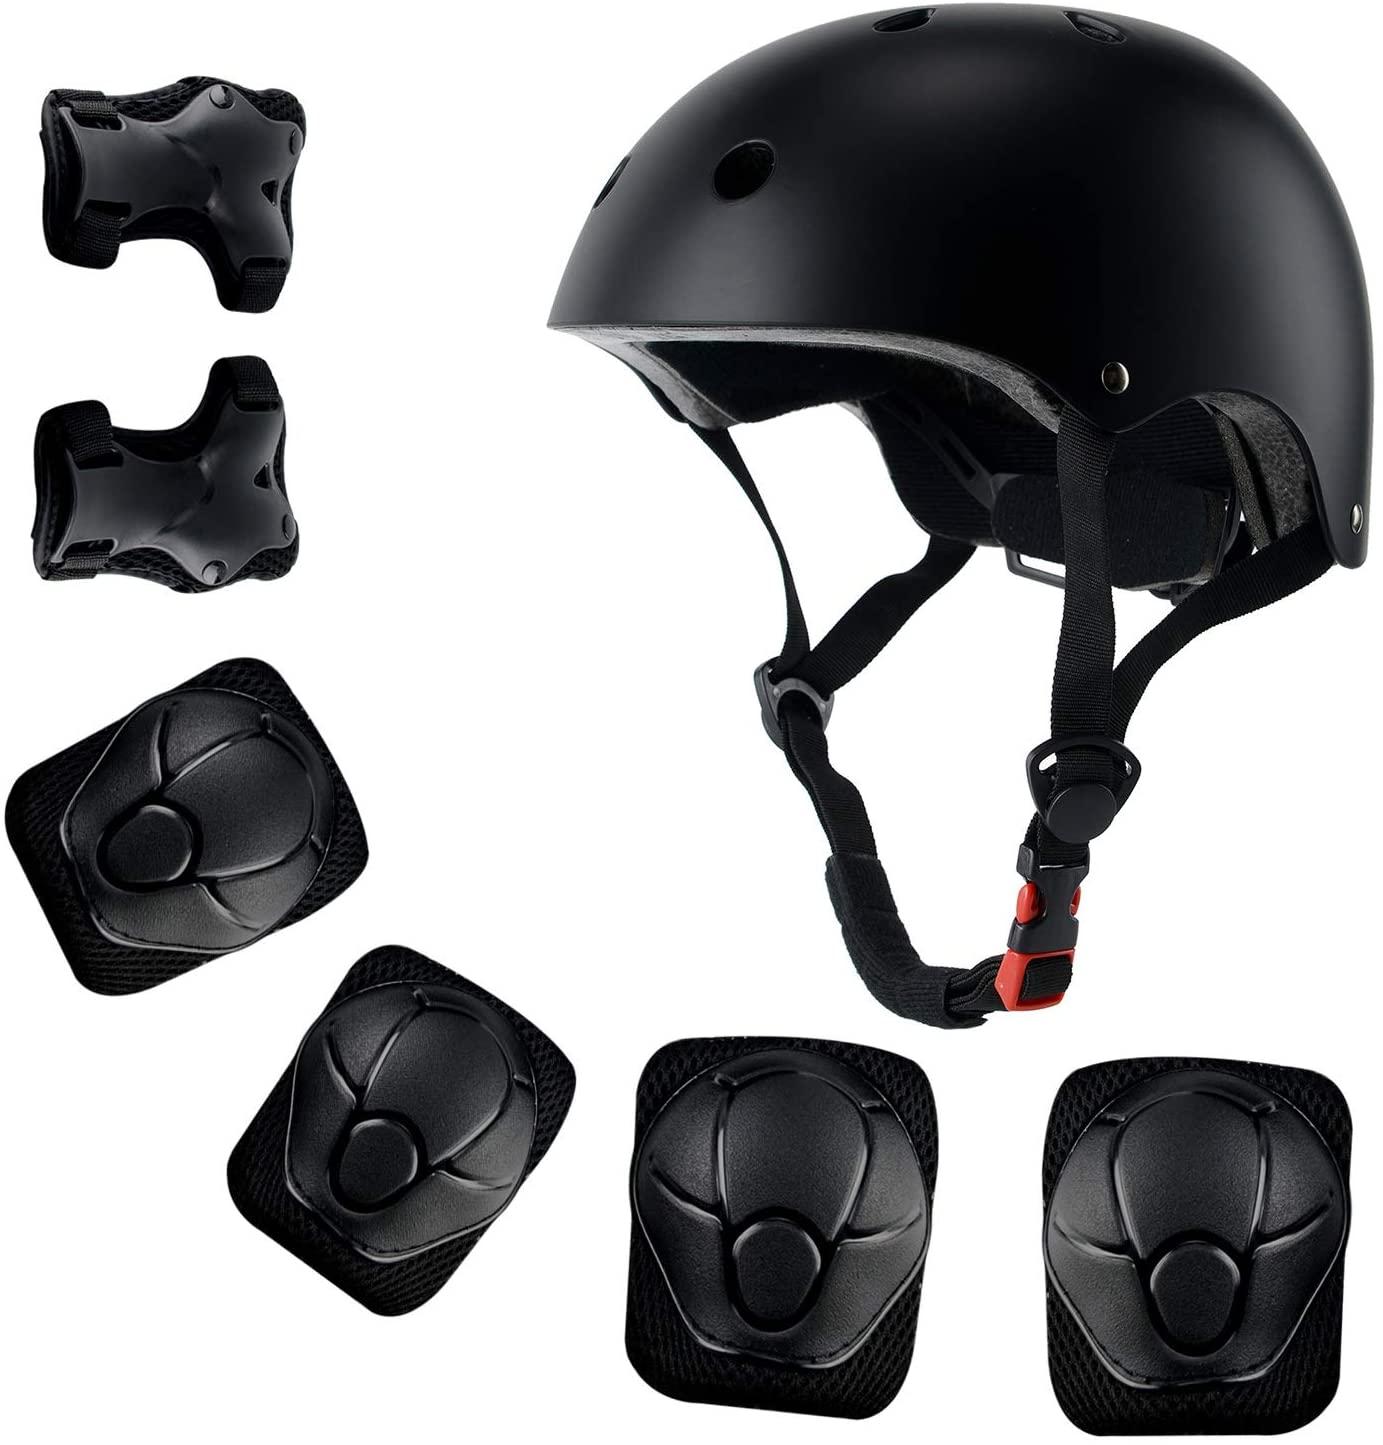 Anharluka Kids Sport Protective Gear Set, Helmet and Pads for Bike Skateboard Skate Scooter